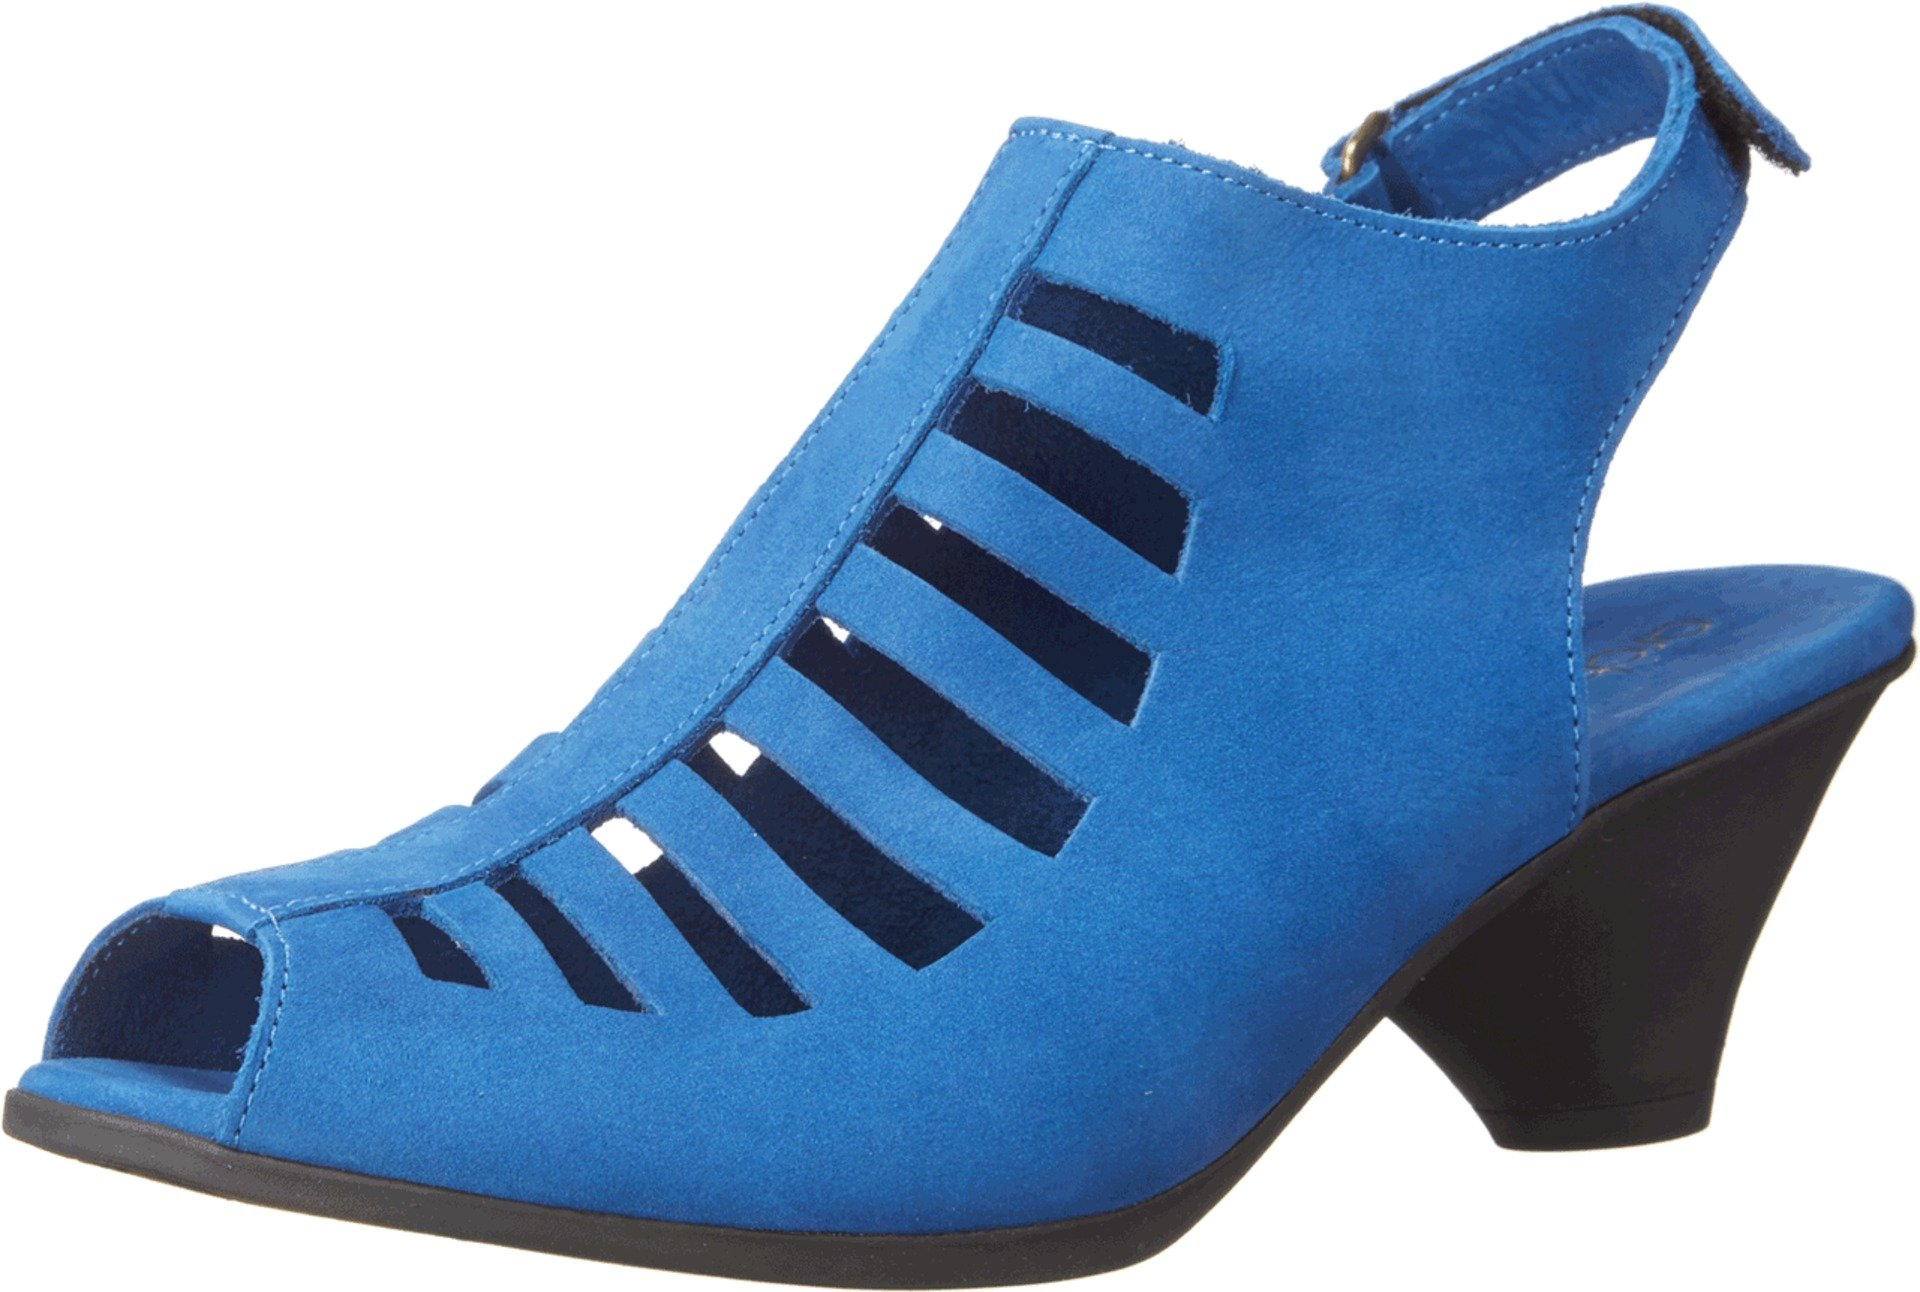 Arche Women's 'Exor' Birdcage Sandal in Miro (Royal Blue) Nubuck (42 EU (US Women's 11 M))